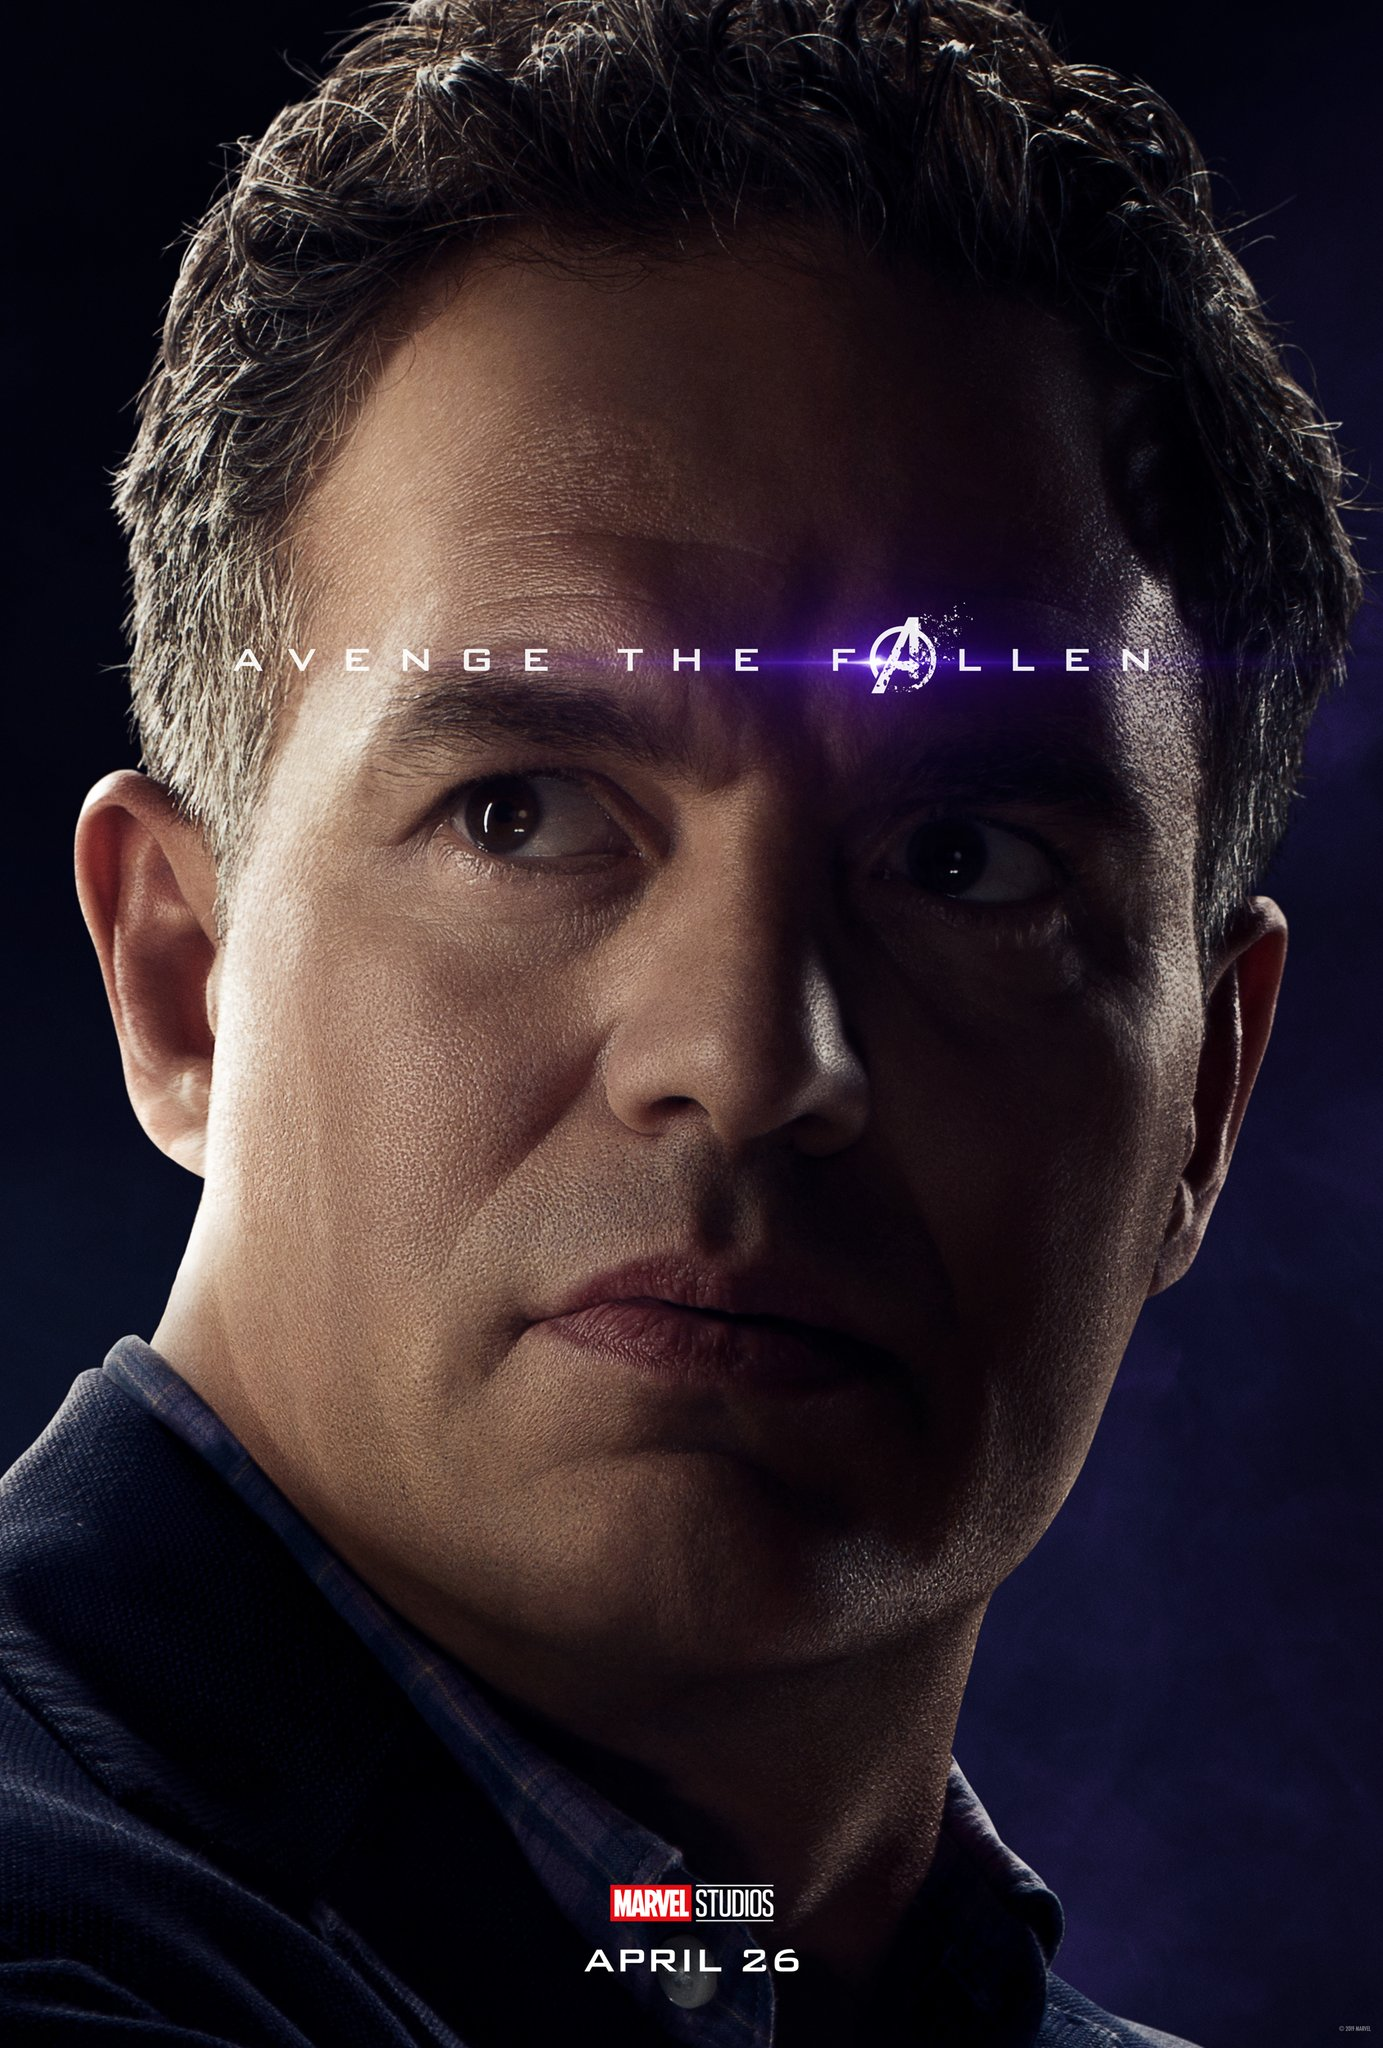 Avenge The Fallen: 32 New Avengers: Endgame Character Posters Arrive – Appocalypse